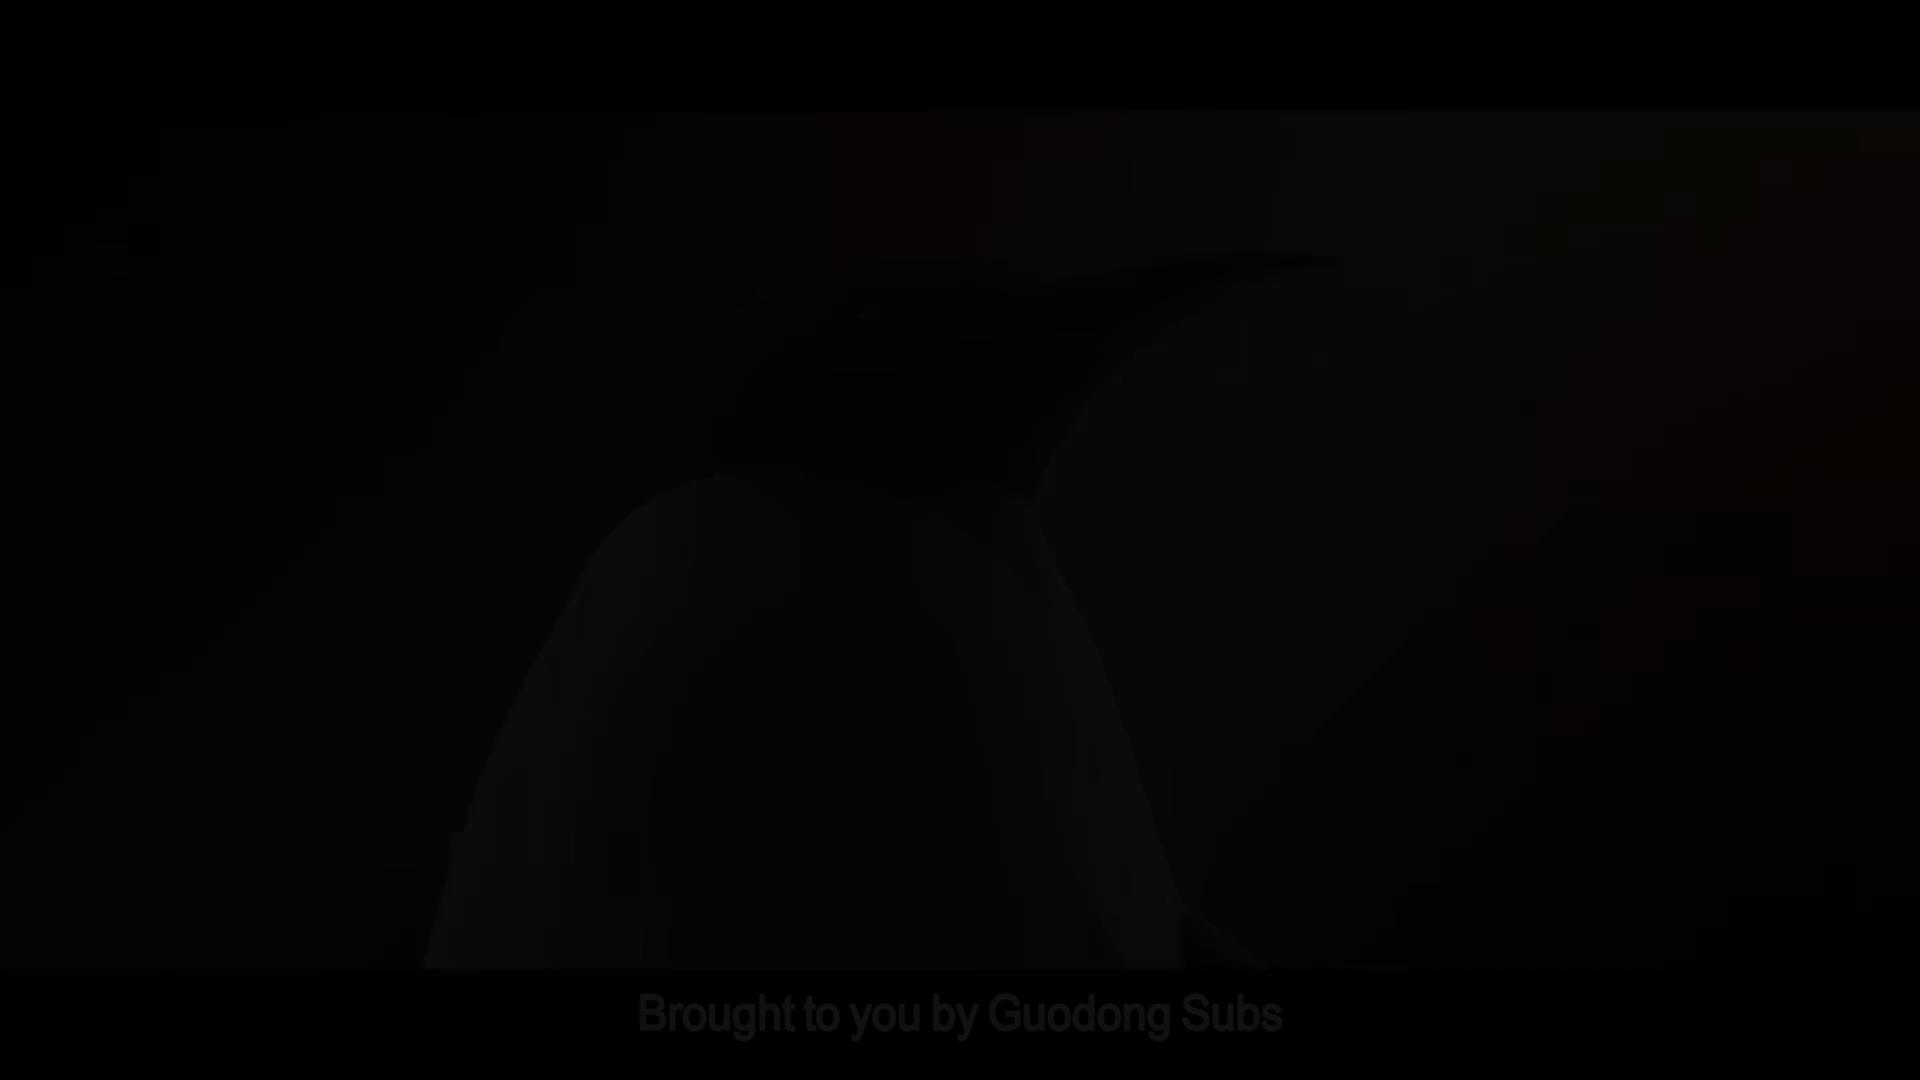 Guodongsubs][Mo Dao Zu Shi][Grandmaster of Demonic